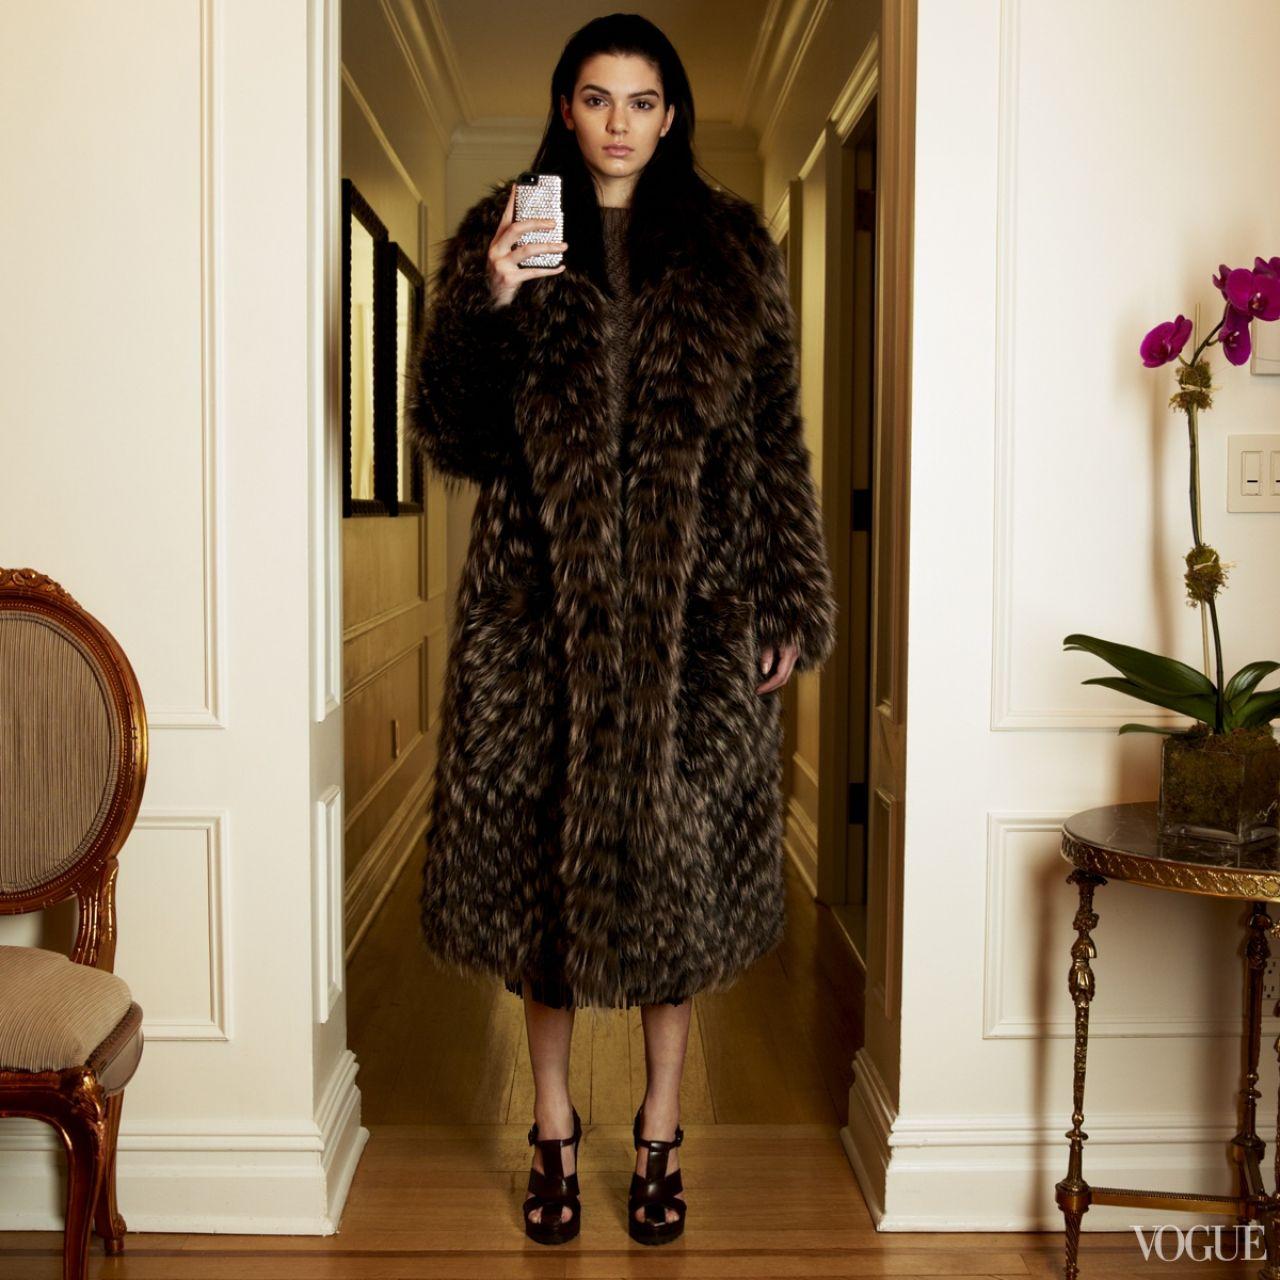 Kendall Jenner Fashion Week Instagram Shoot For Vogue